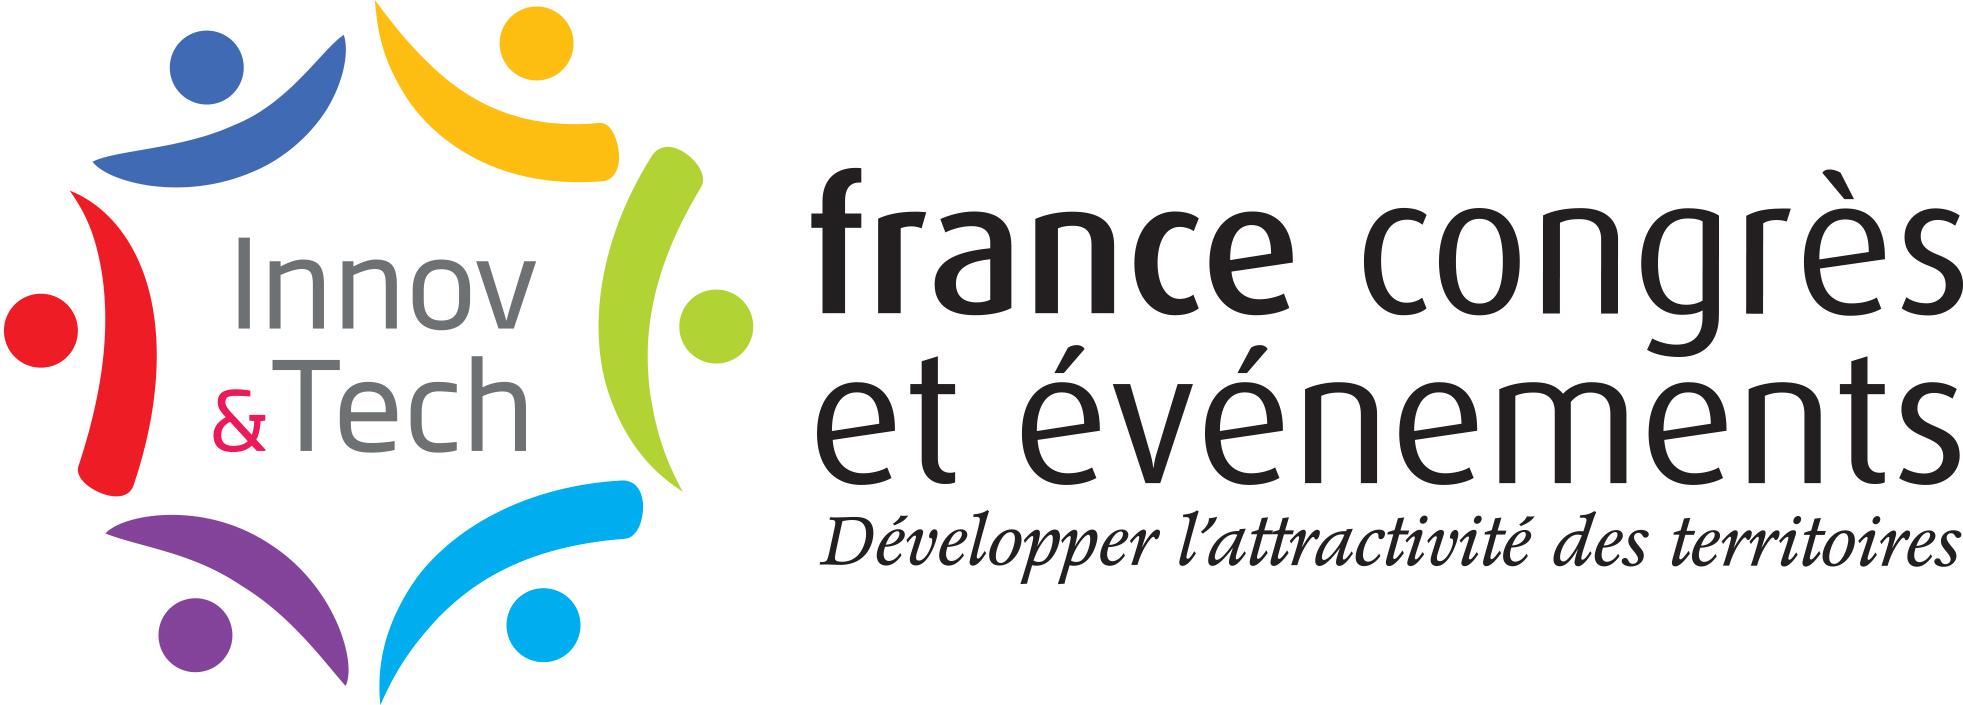 Francecongresnouveaulogo2017cmjnhorizontalinnov1530112474153011247415307853381530785338